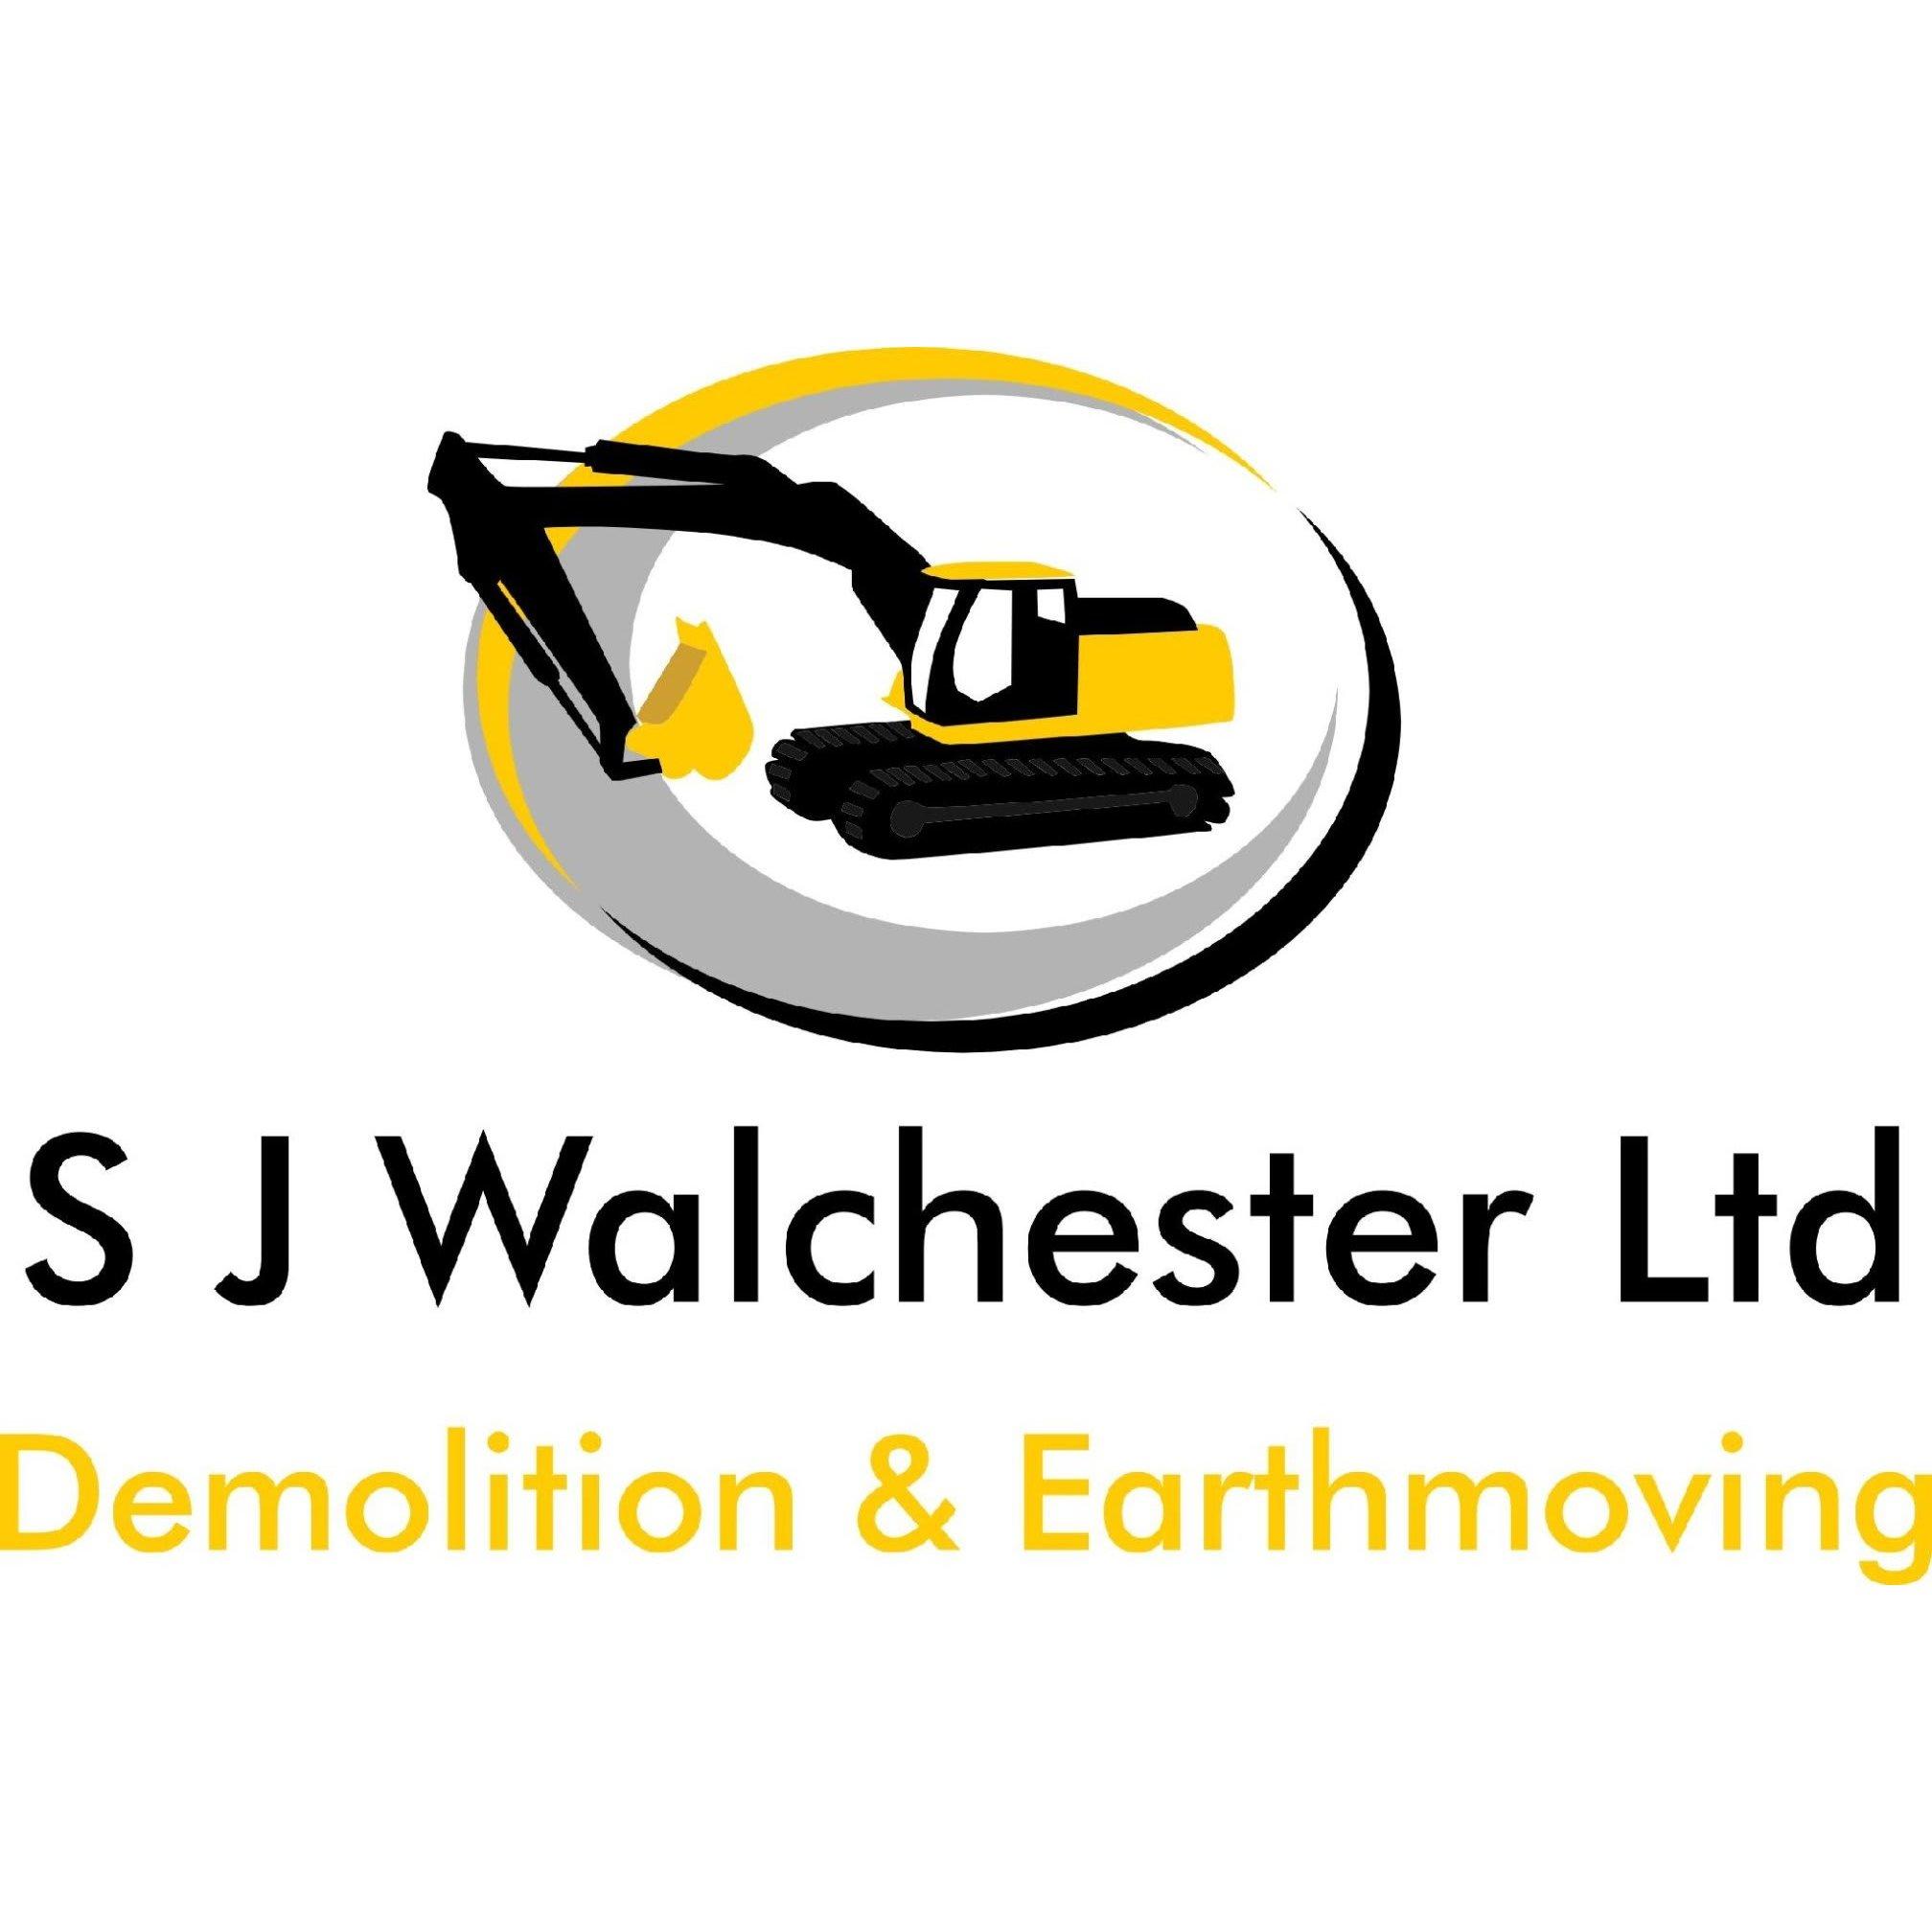 S.J Walchester Ltd - Stoke-On-Trent, Staffordshire ST10 2PG - 01538 755451 | ShowMeLocal.com